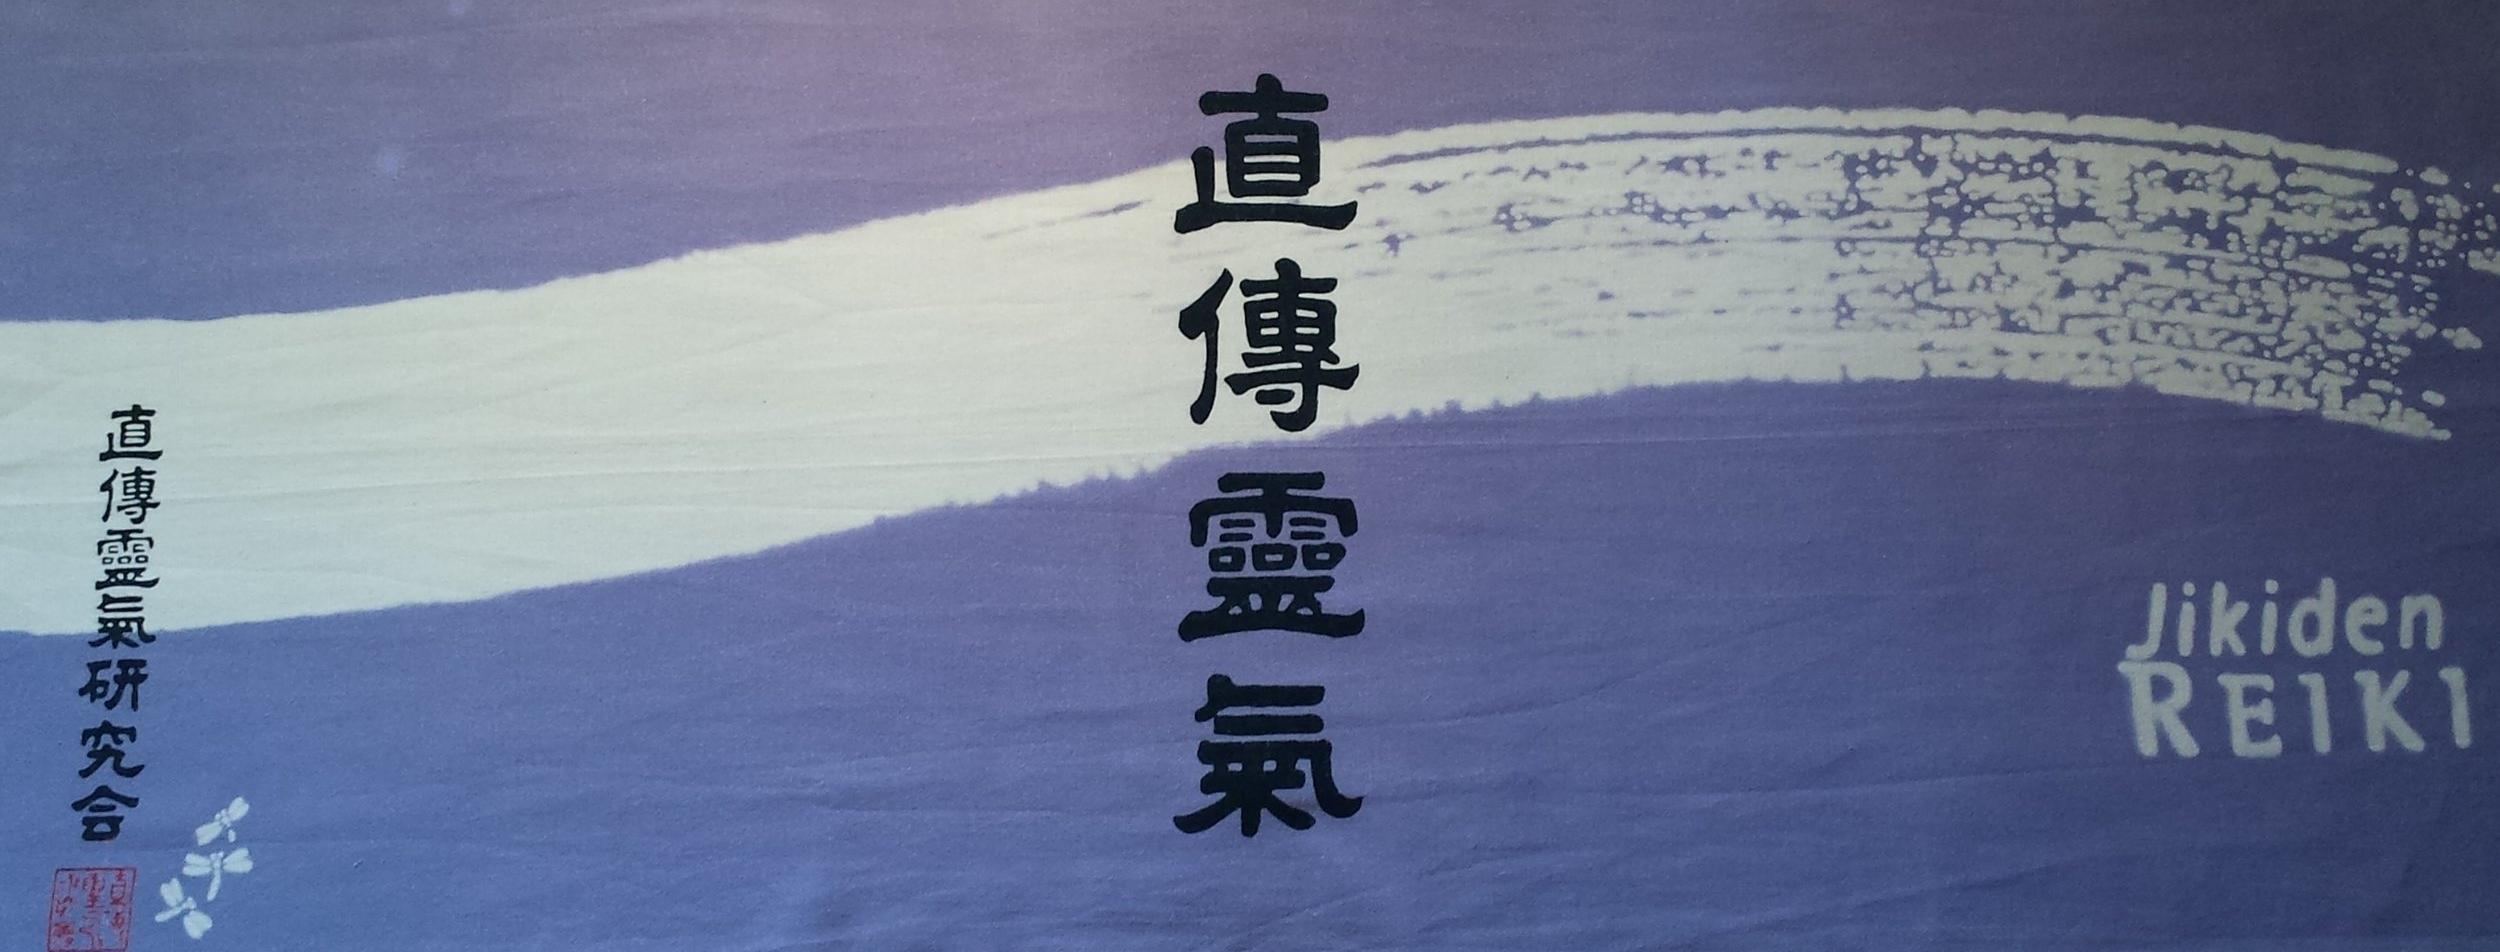 Jikiden Reiki stdent events